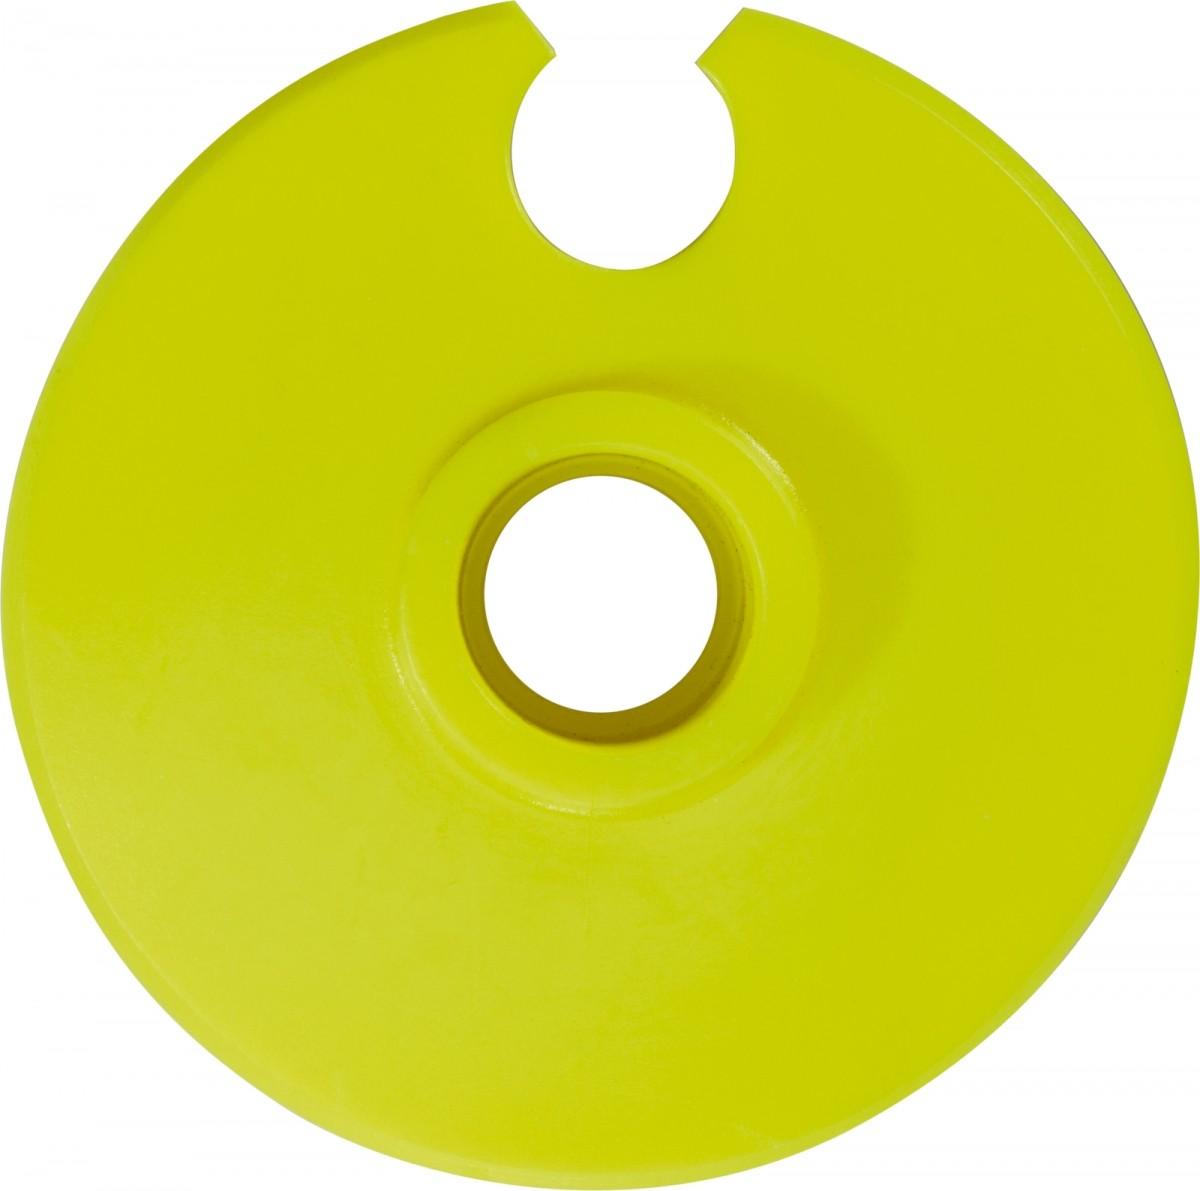 Leki Krogec (krpljica) za SL palice (62mm) - rumena